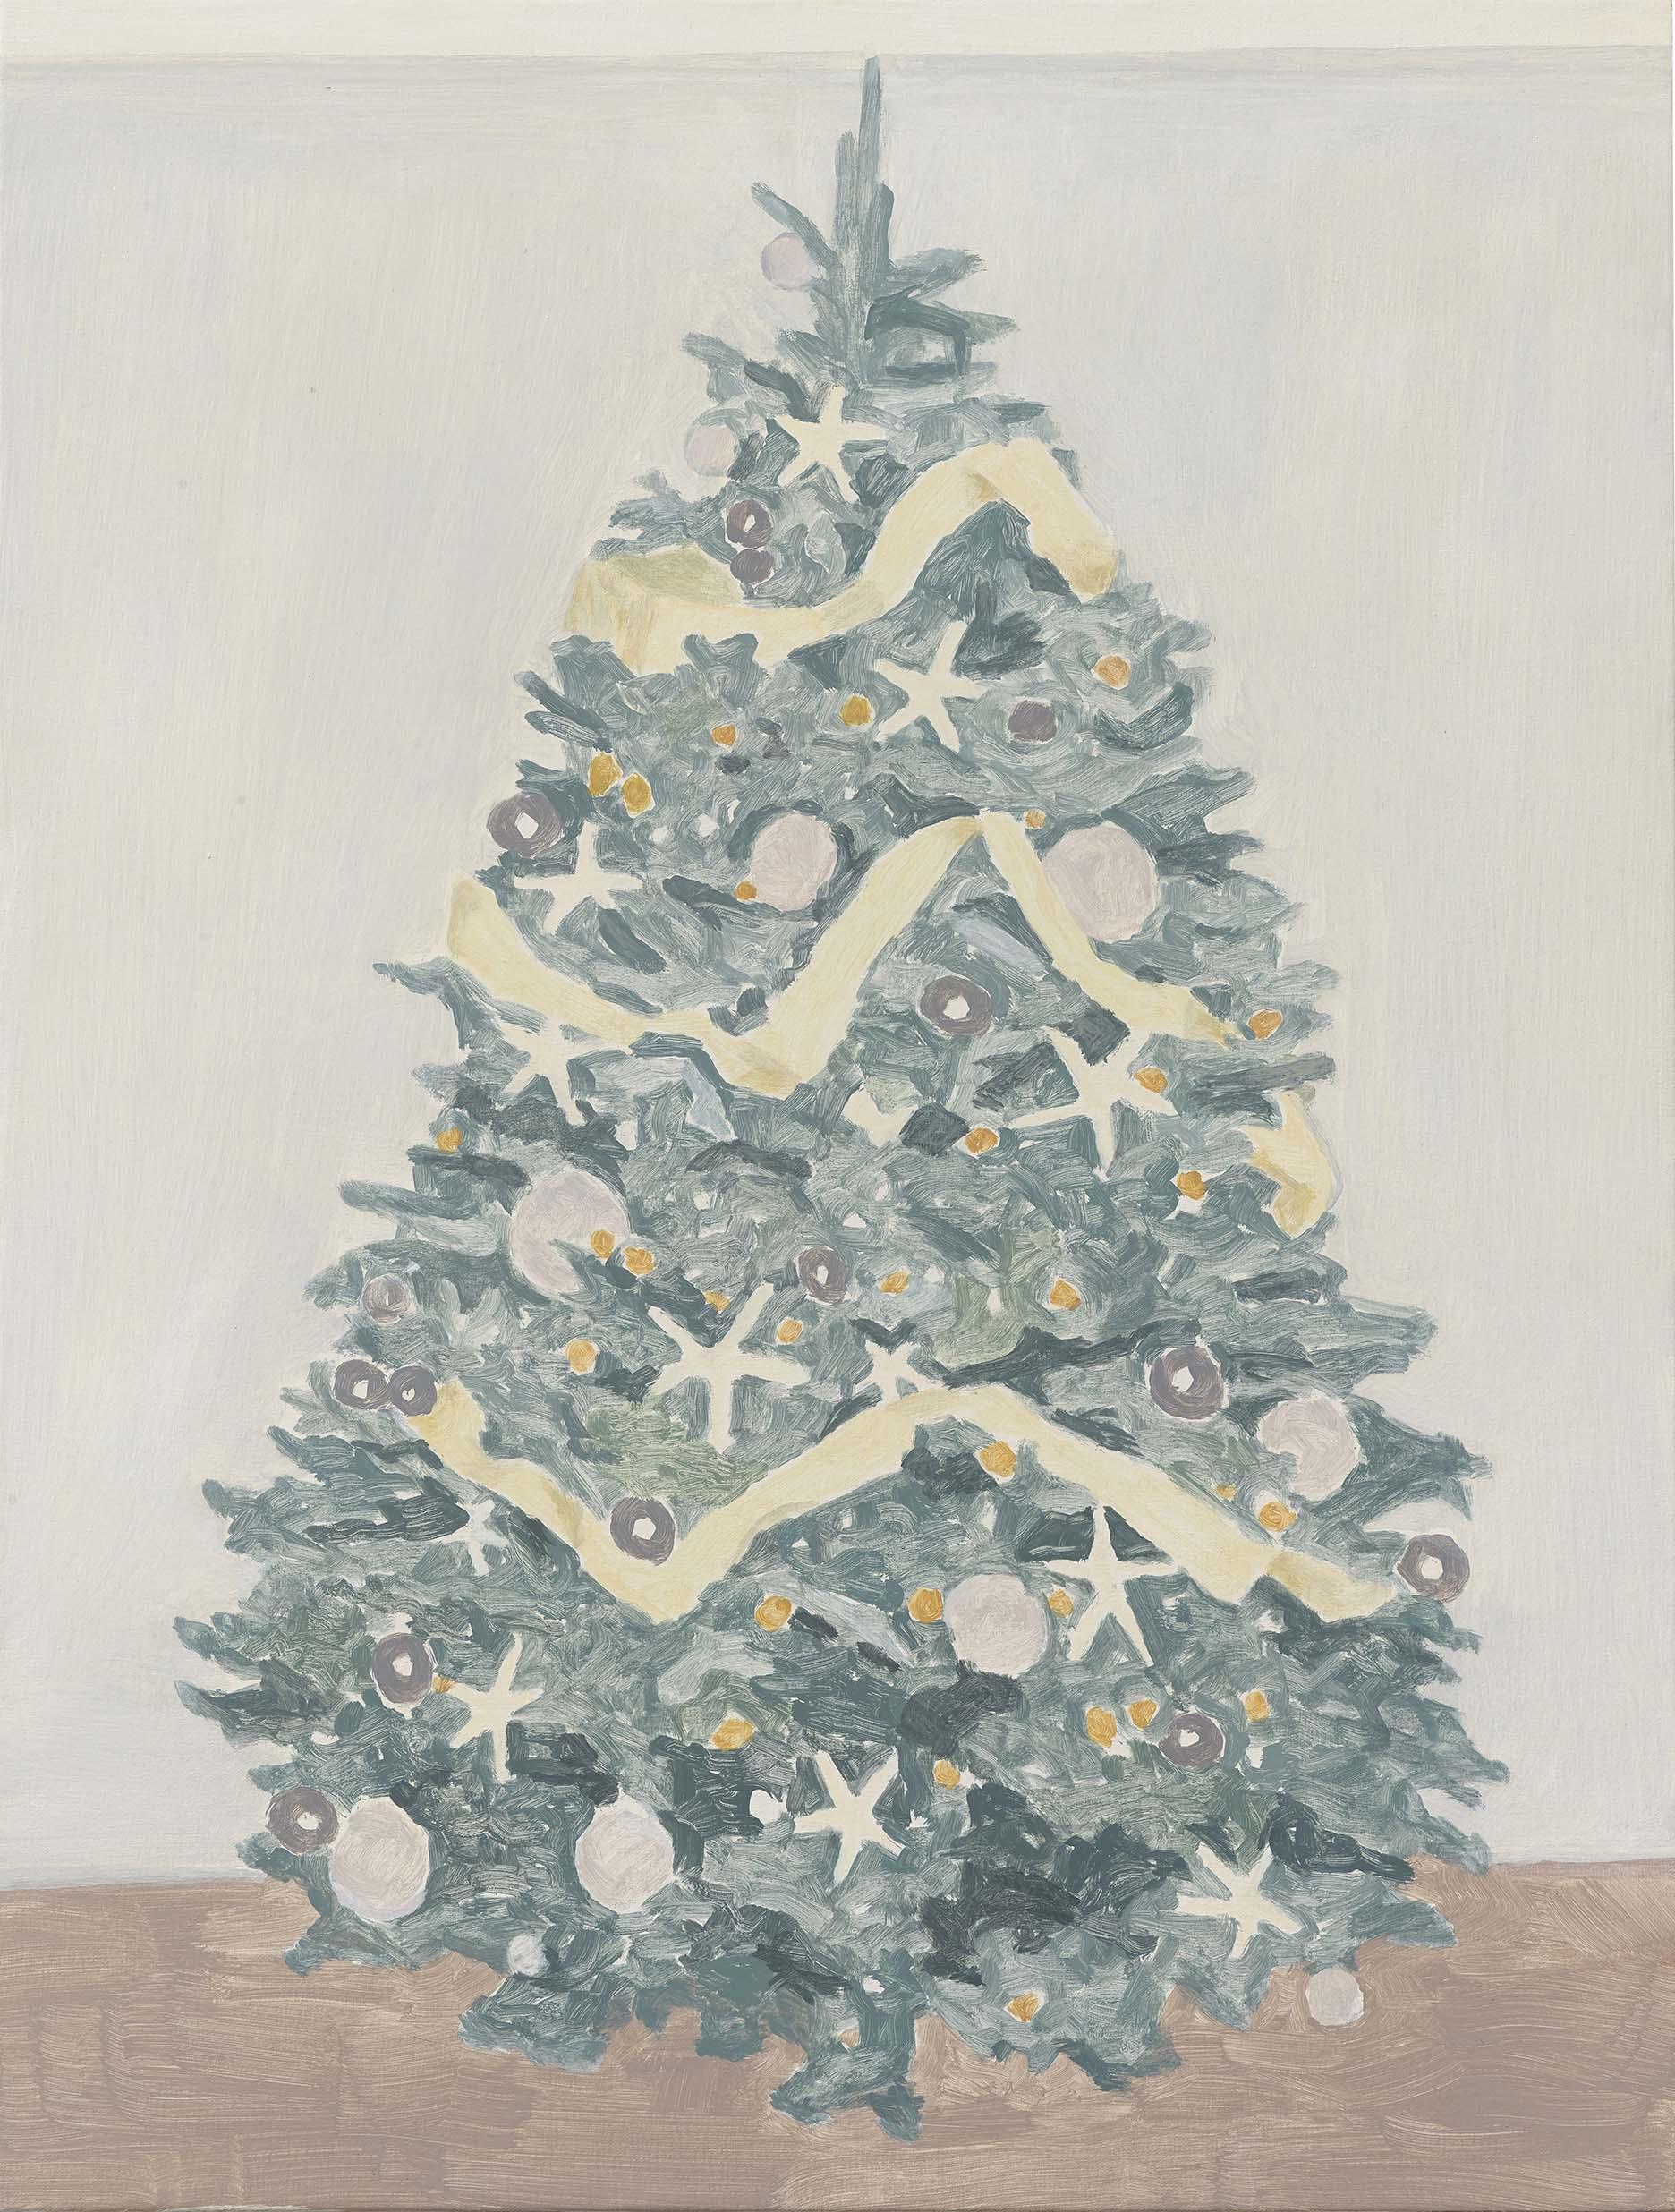 Xmas Tree (large stars), acrylic on canvas, 32 x 24.25 inches, 2015.